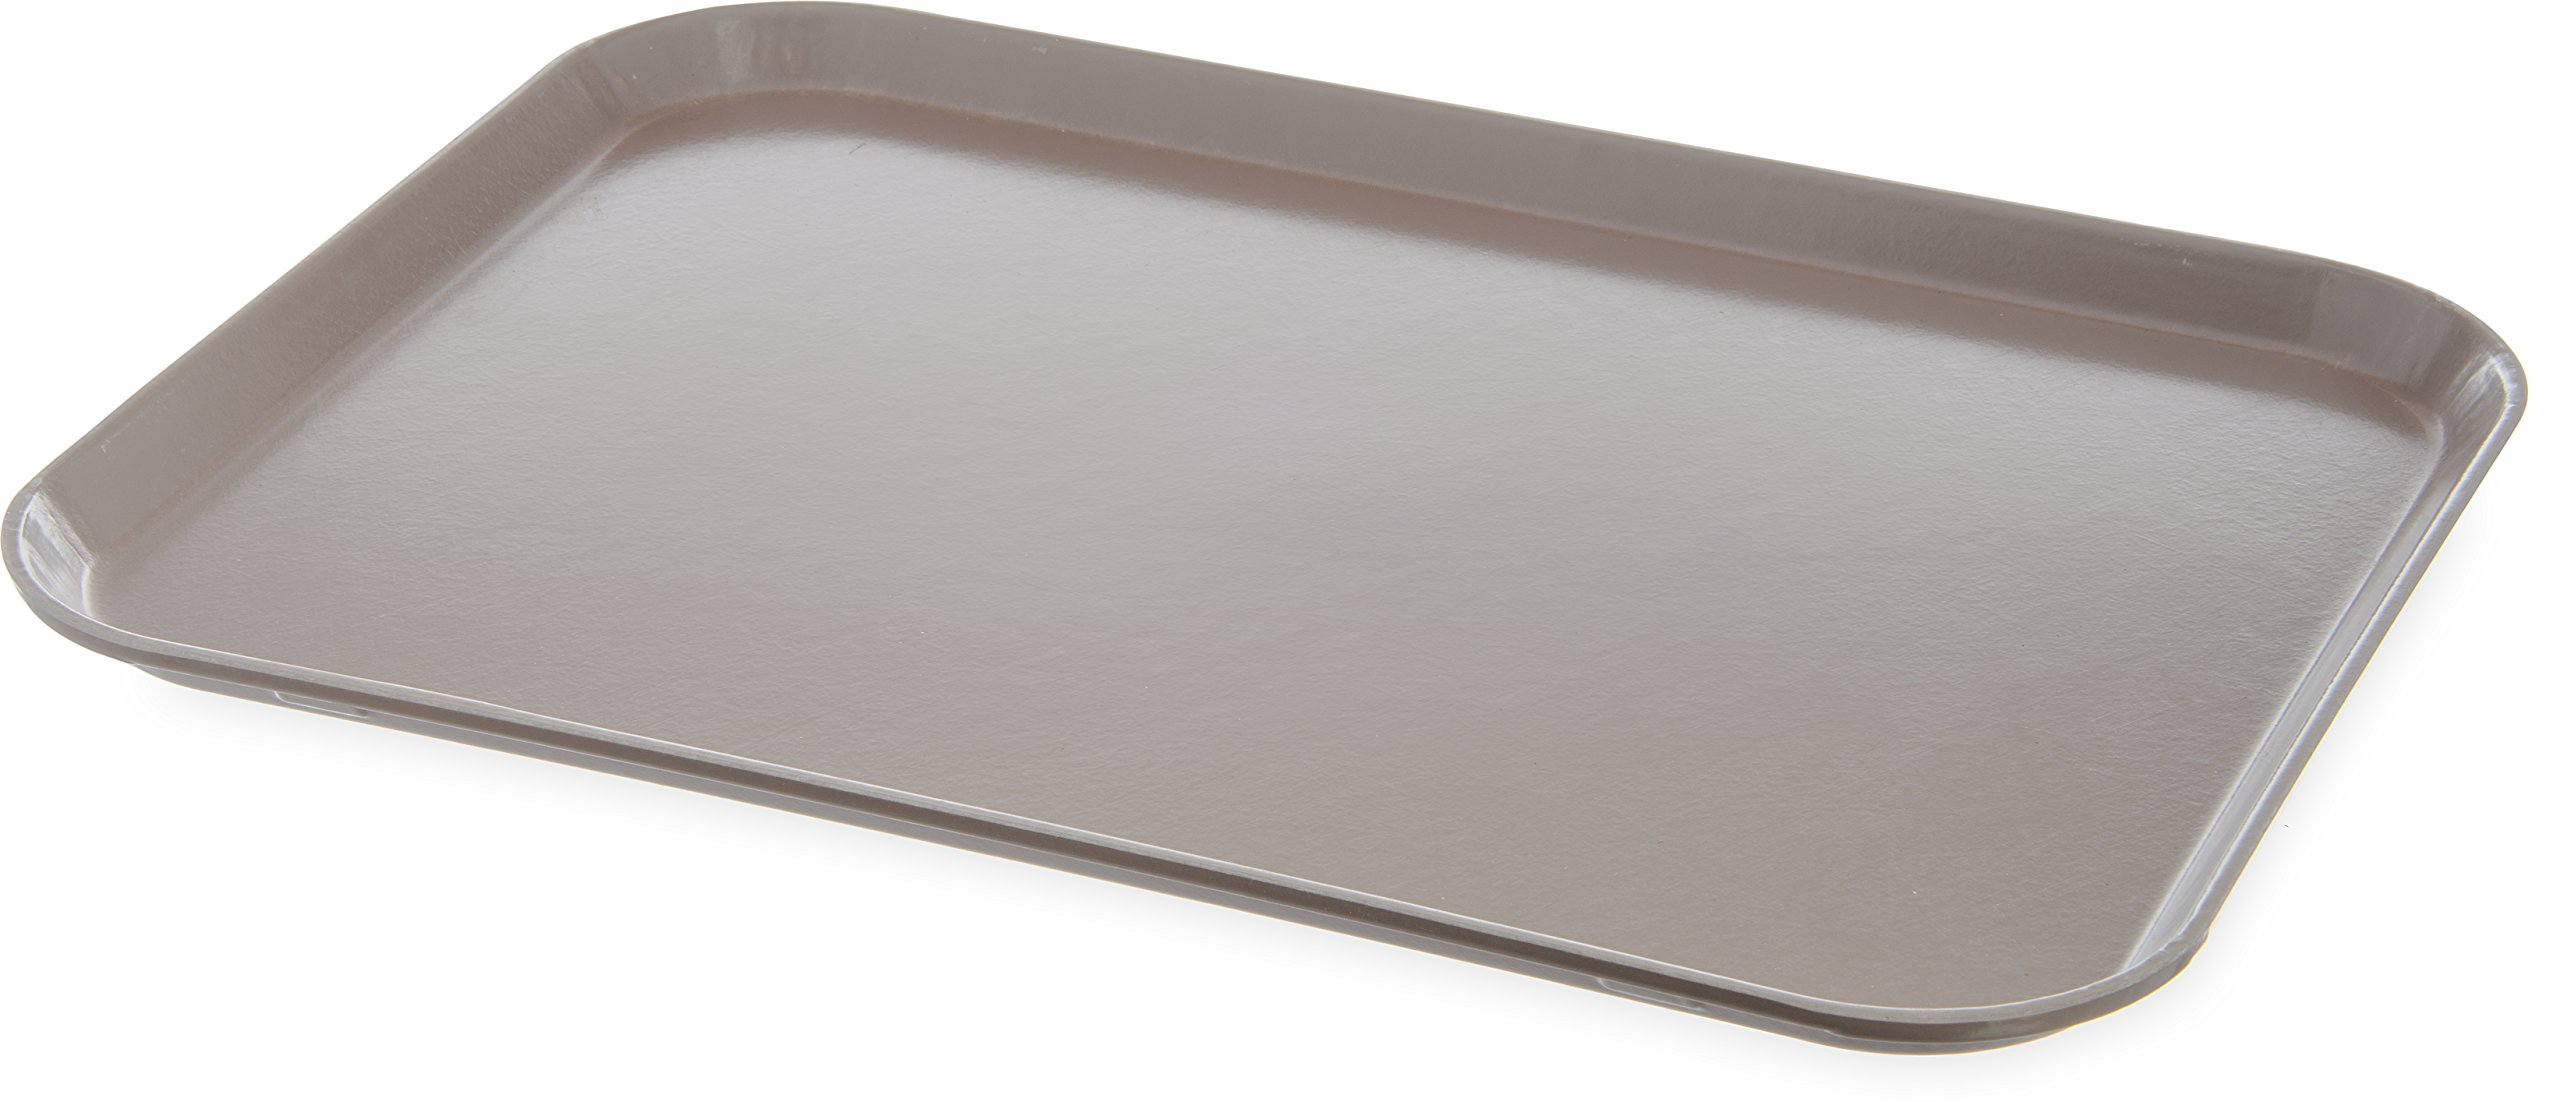 Dinex DX1089M31 Fiberglass Hospital Fast Food Tray, 0.5'' Height, 20'' Width, 15'' Length, Fiberglass, Latte (Pack of 12) by Dinex